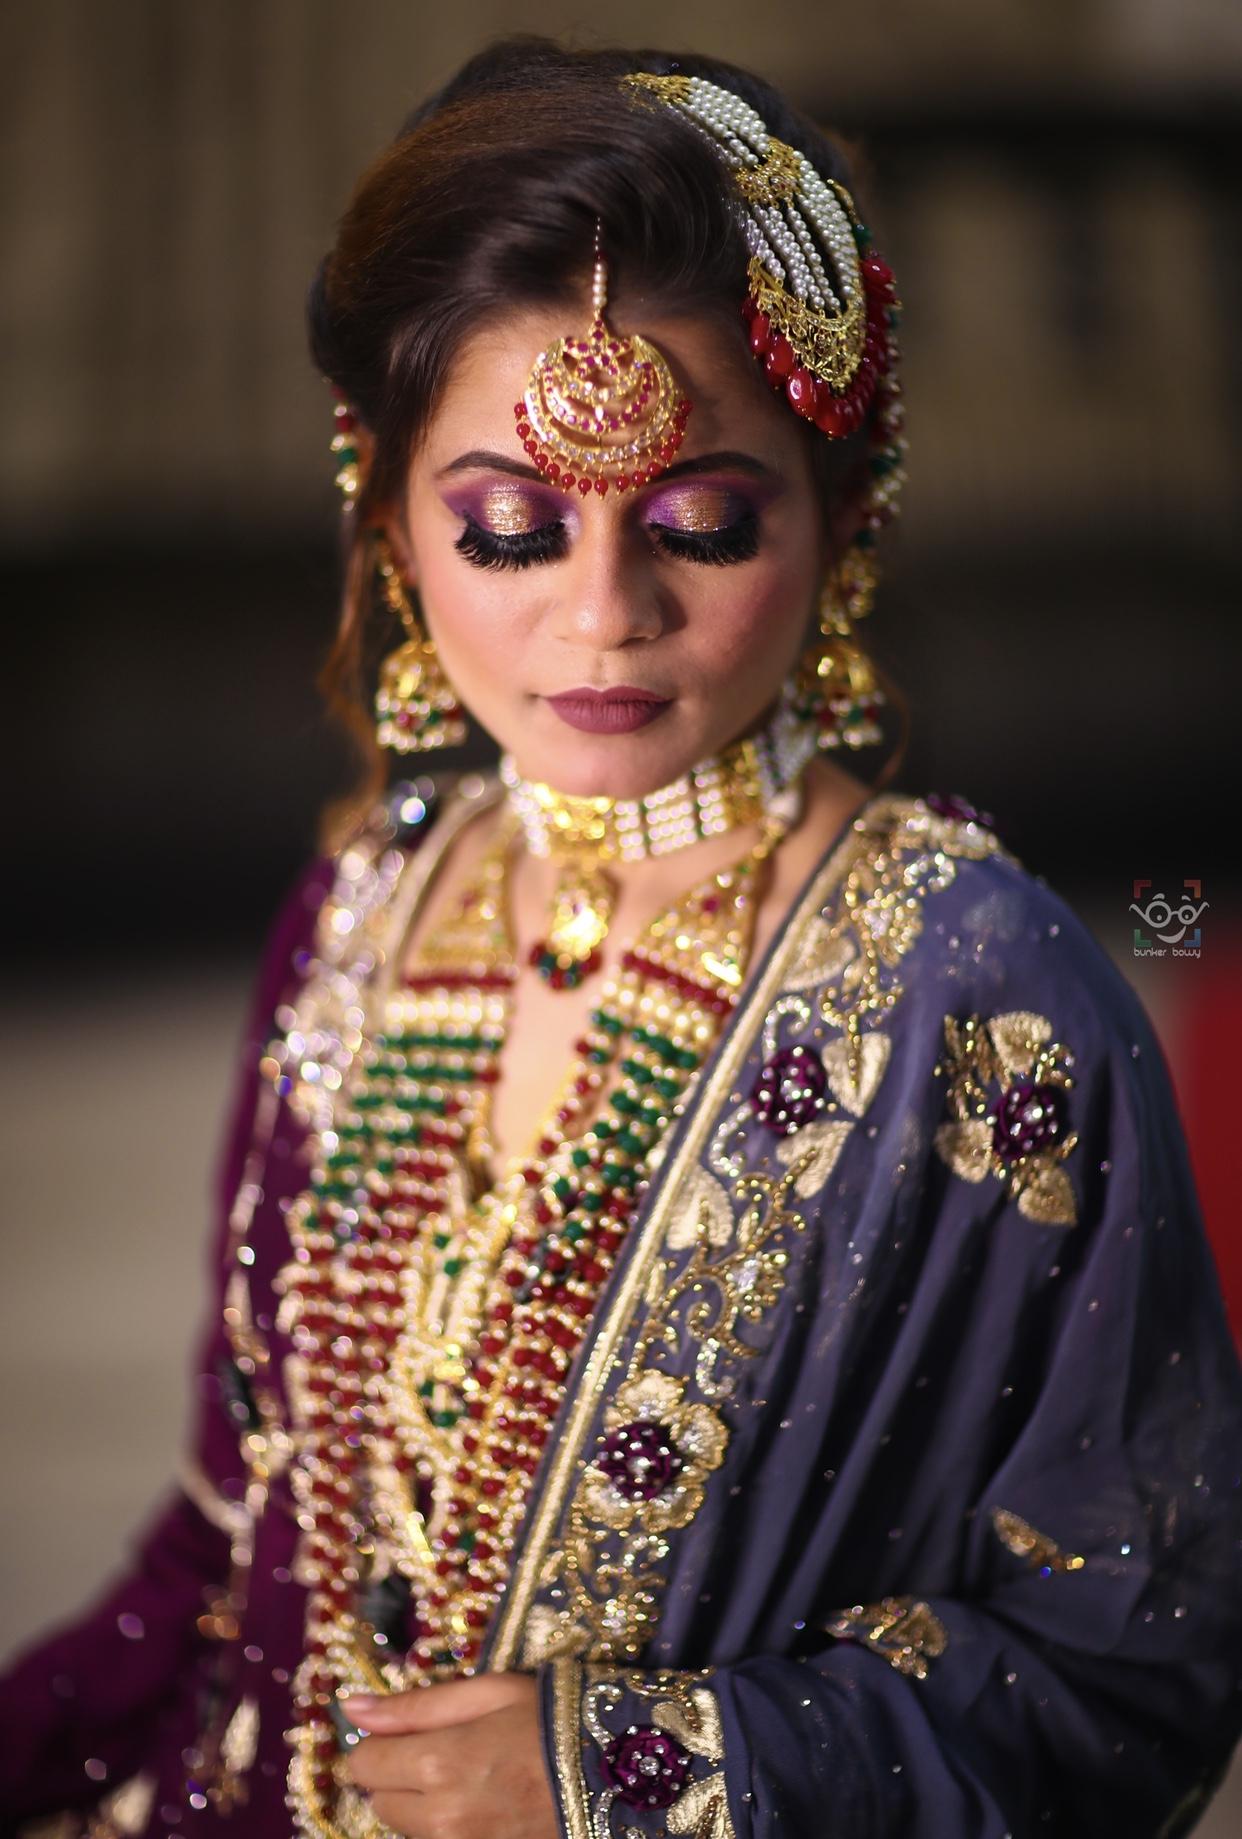 rabab-fatima-makeup-artist-hyderabad